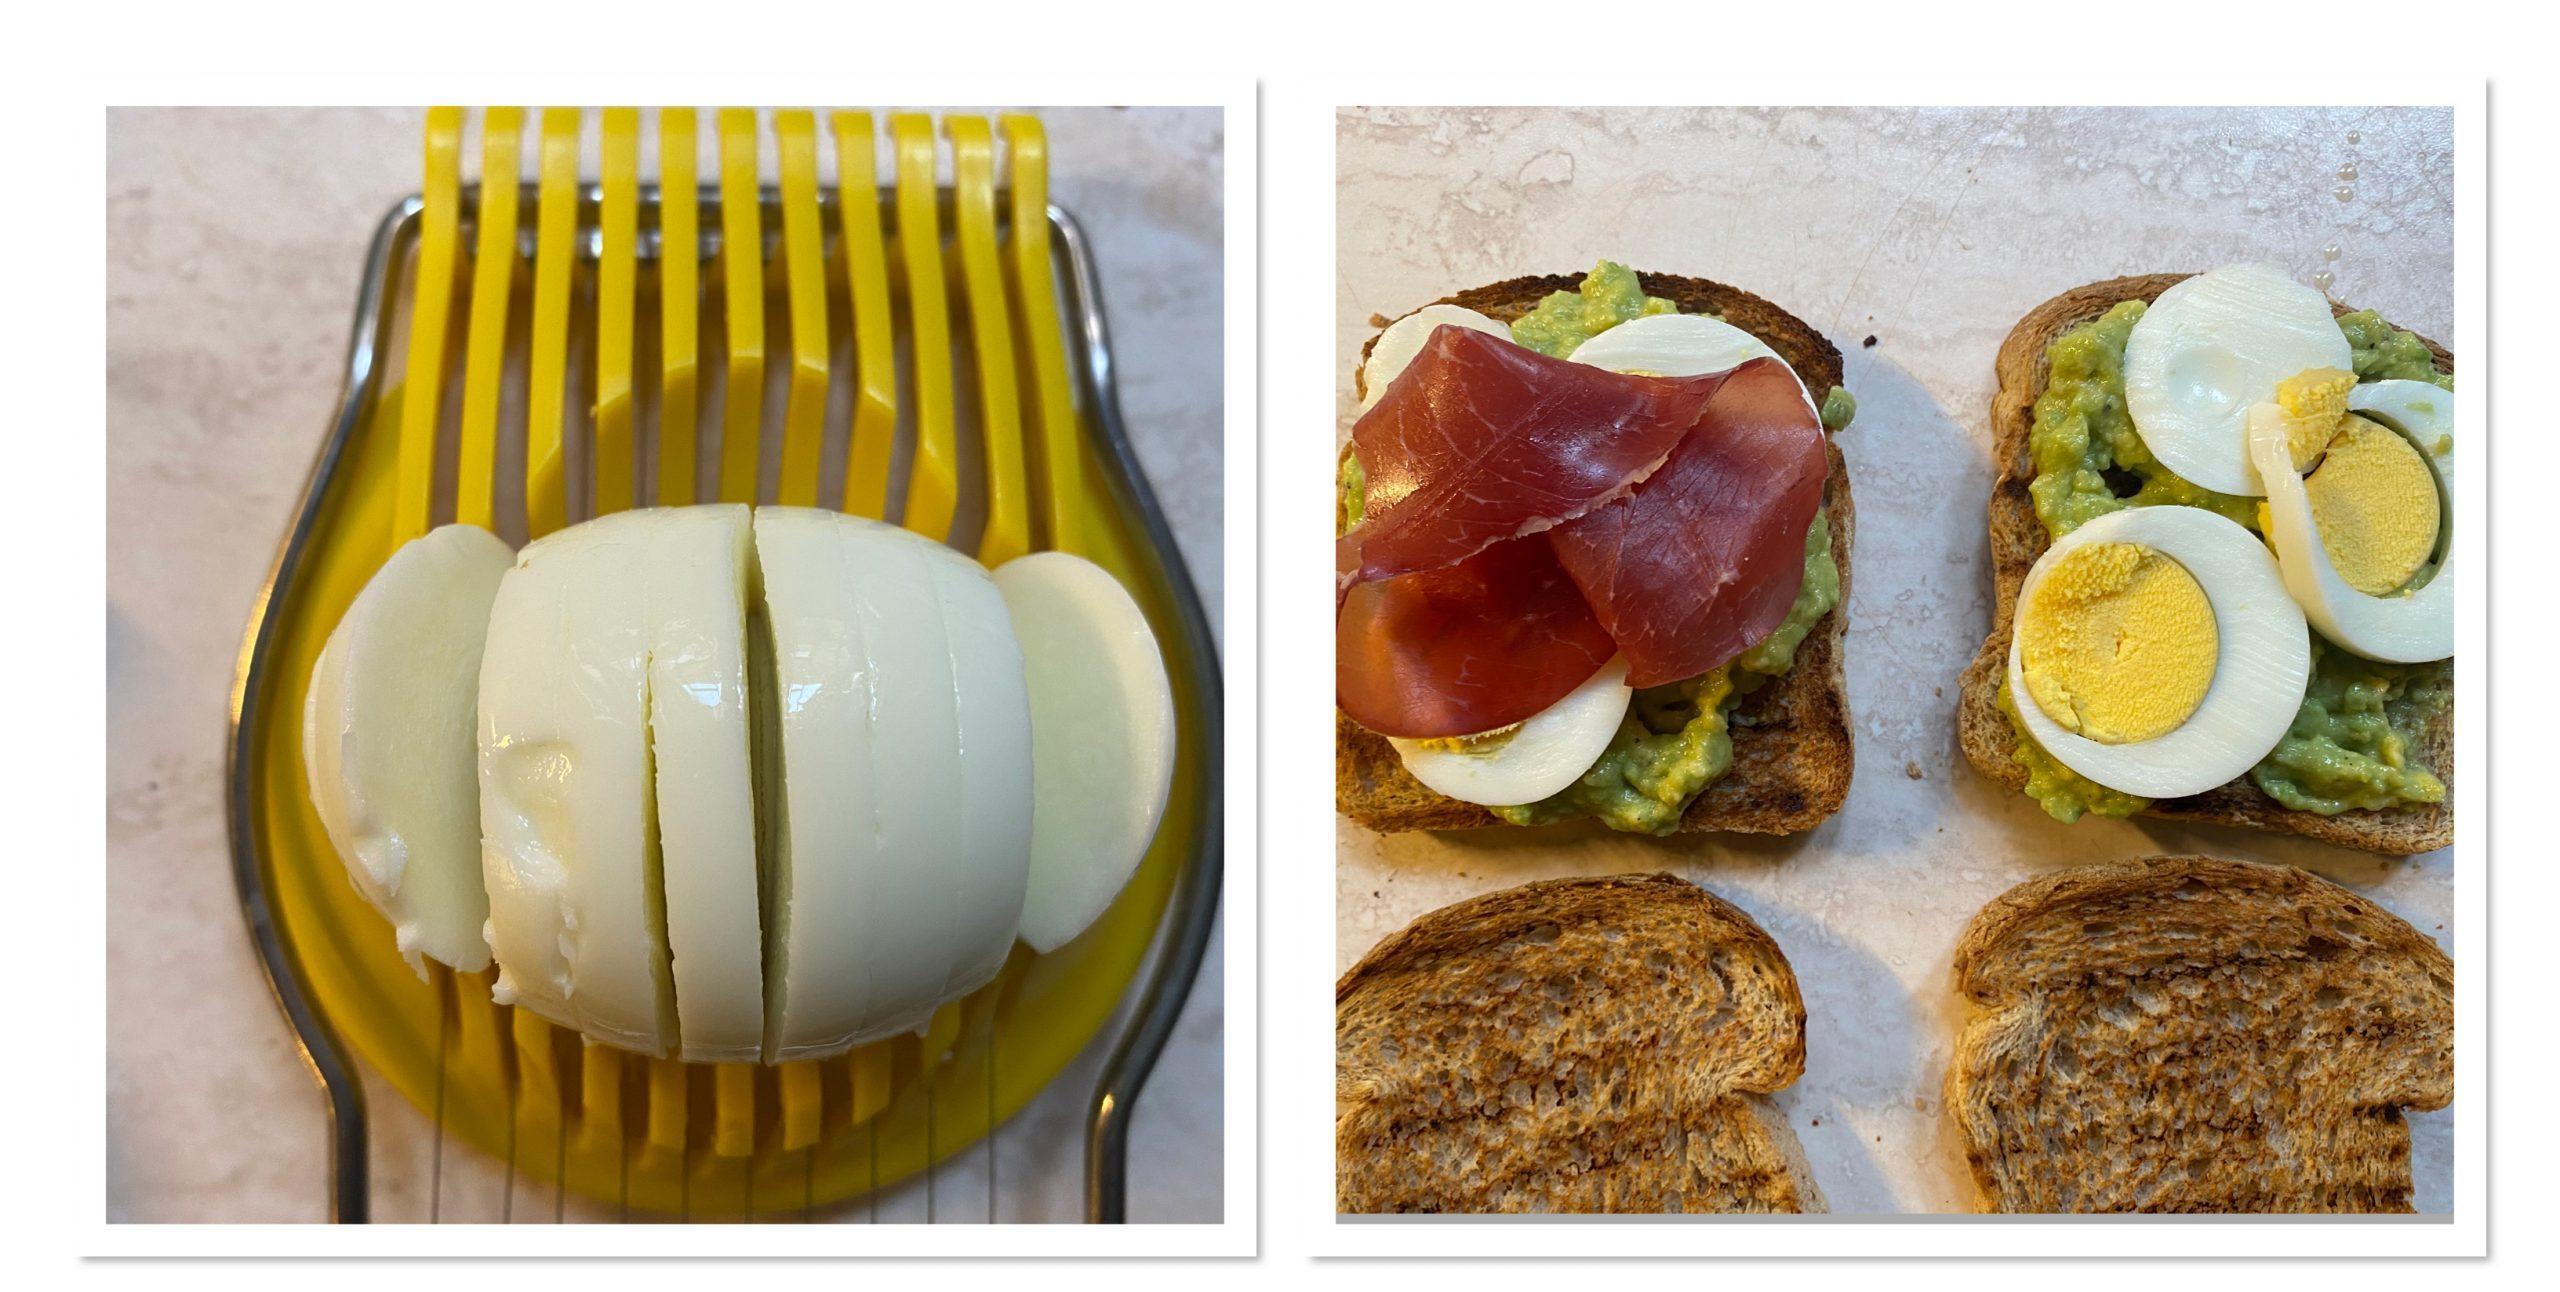 Avocado toast con uova sode e bresaola